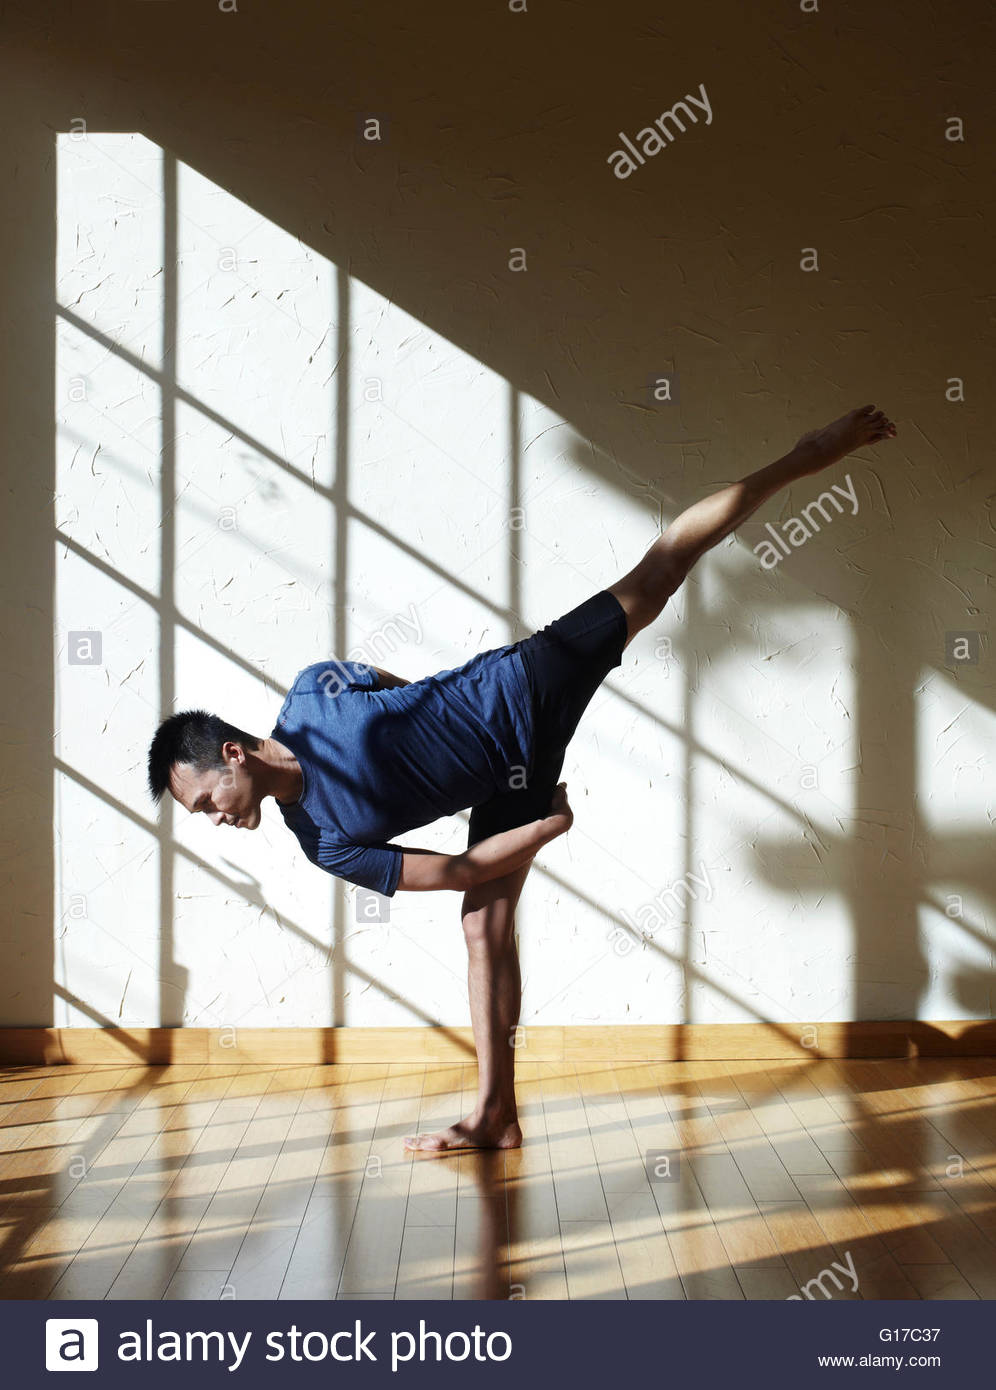 Man doing yoga in studio, in half moon bind position - Stock Image